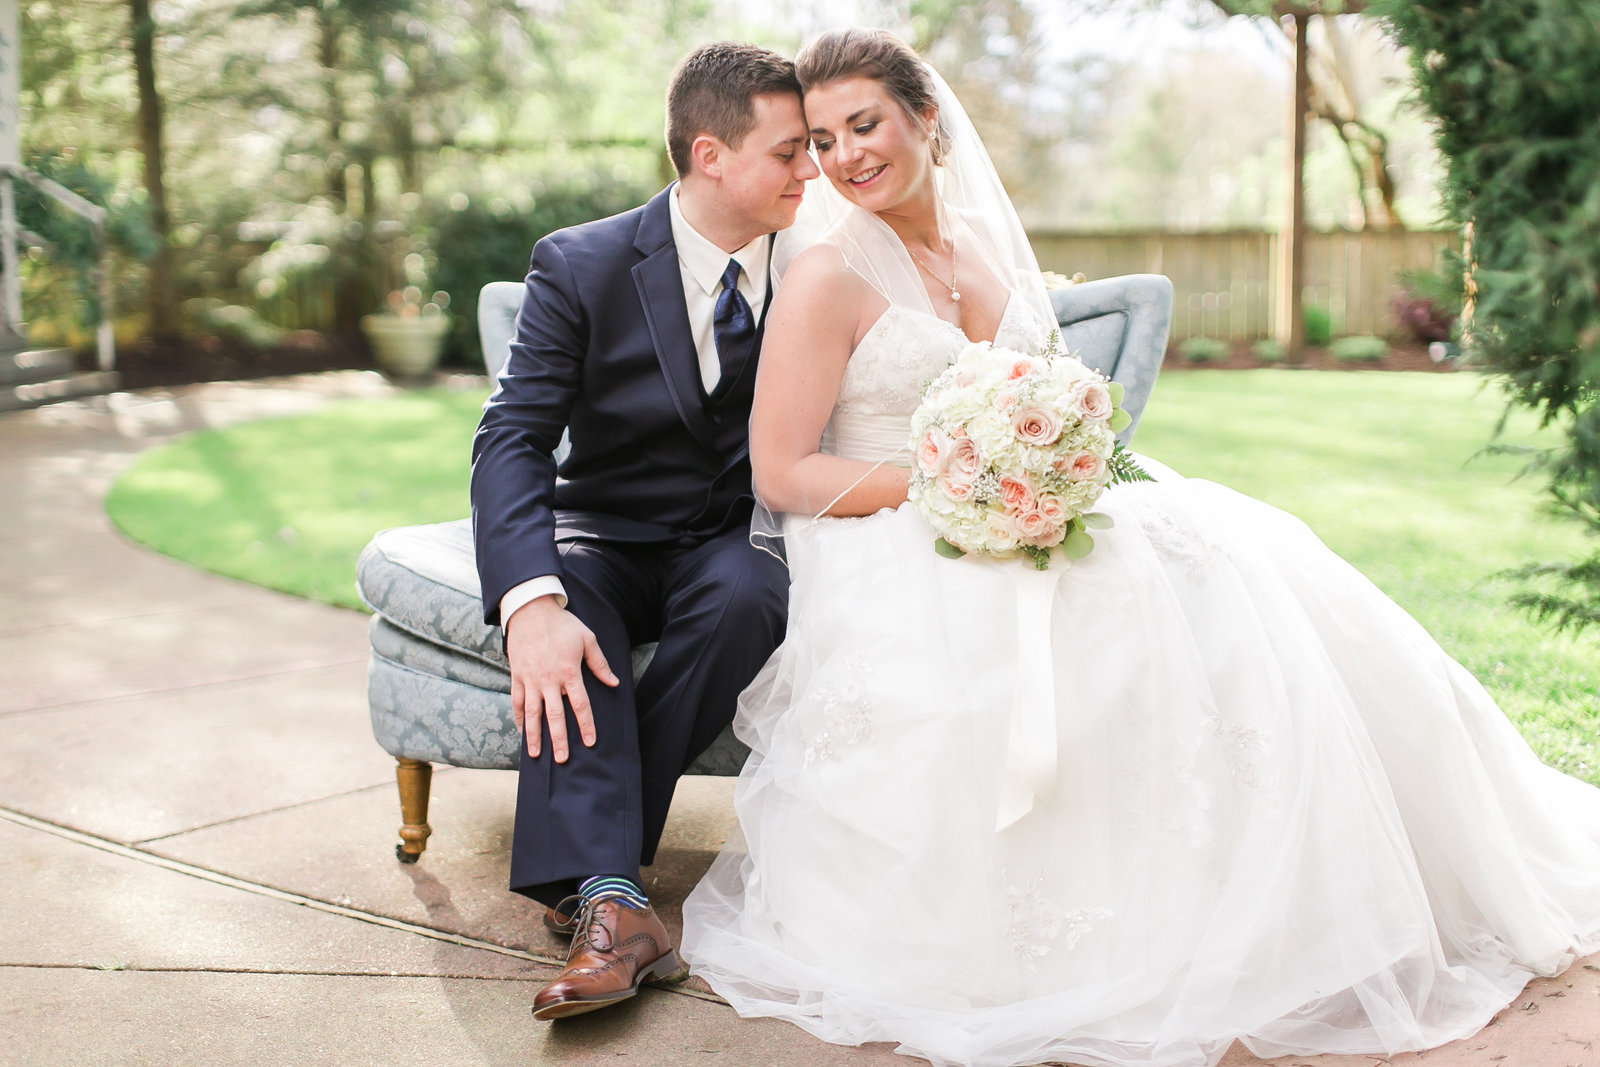 jillian-martin-wedding453408